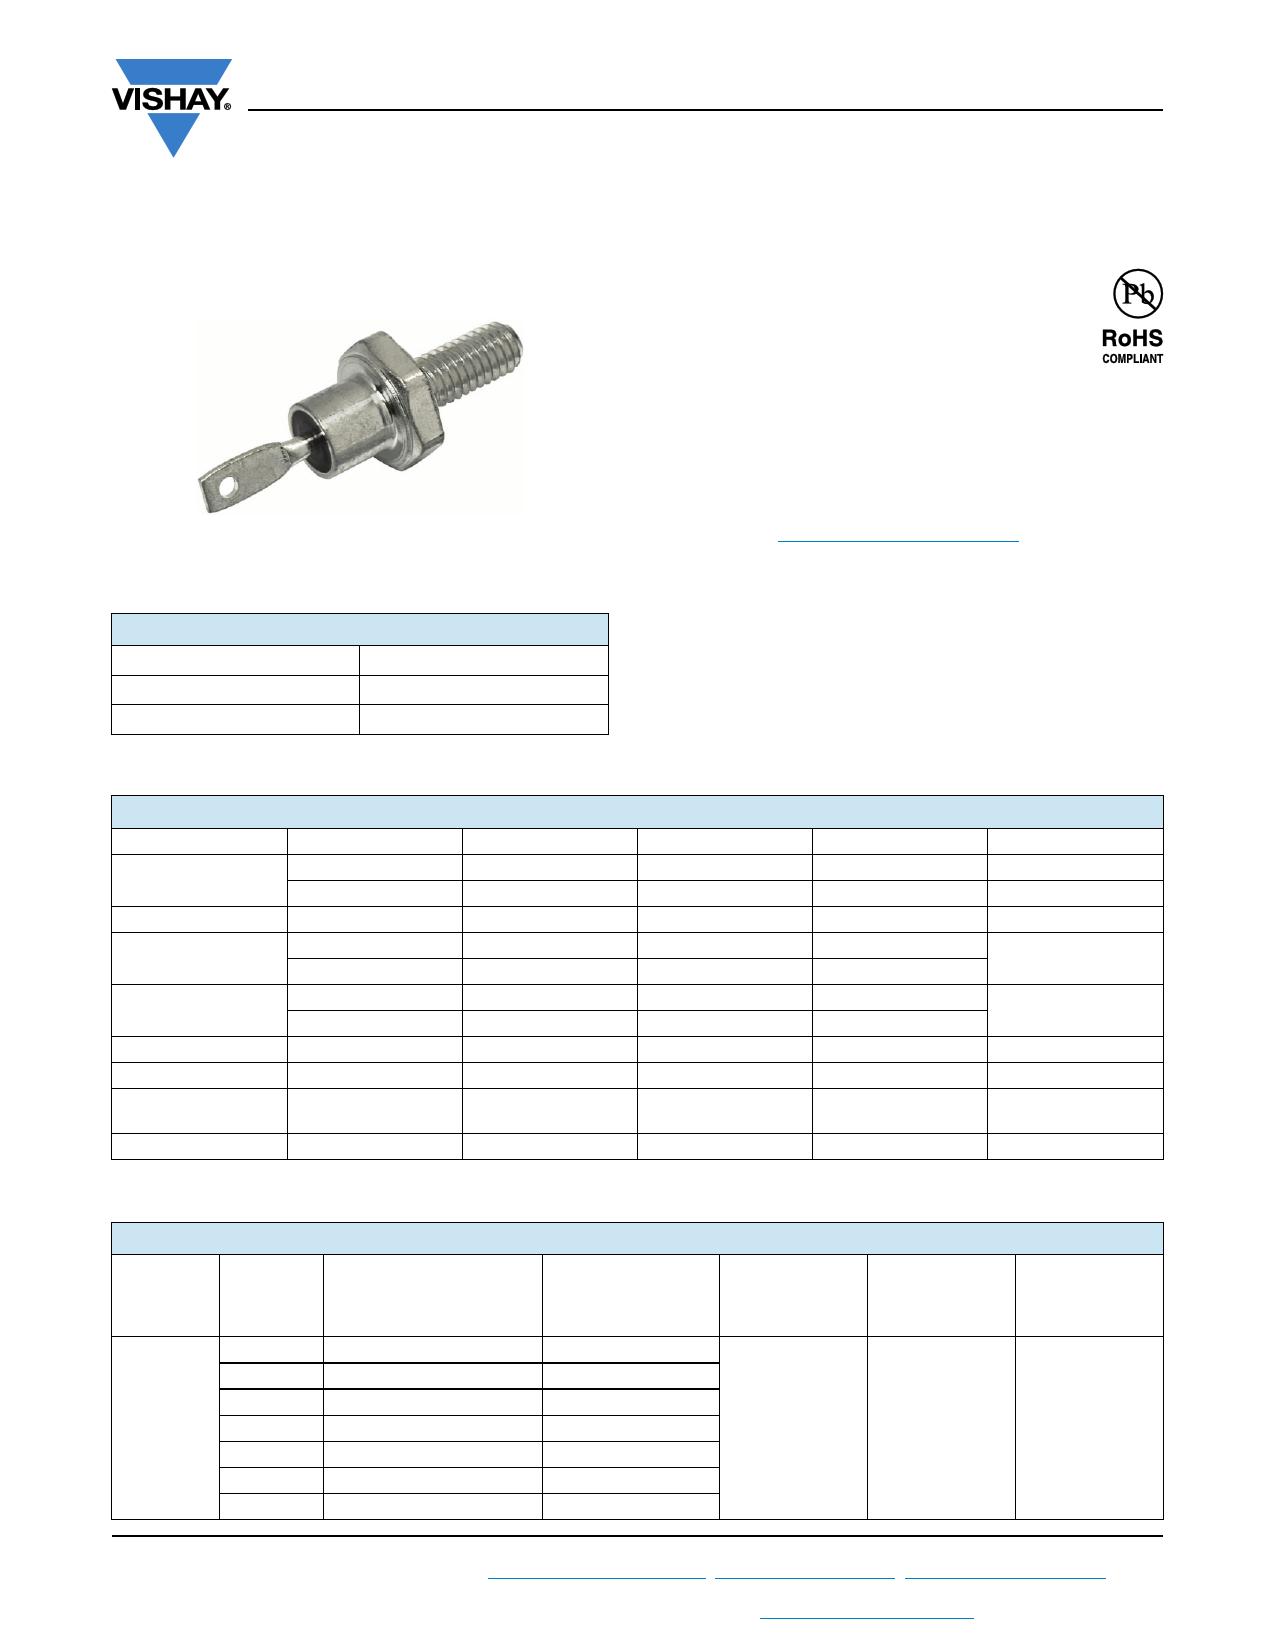 VS-1N3890 datasheet